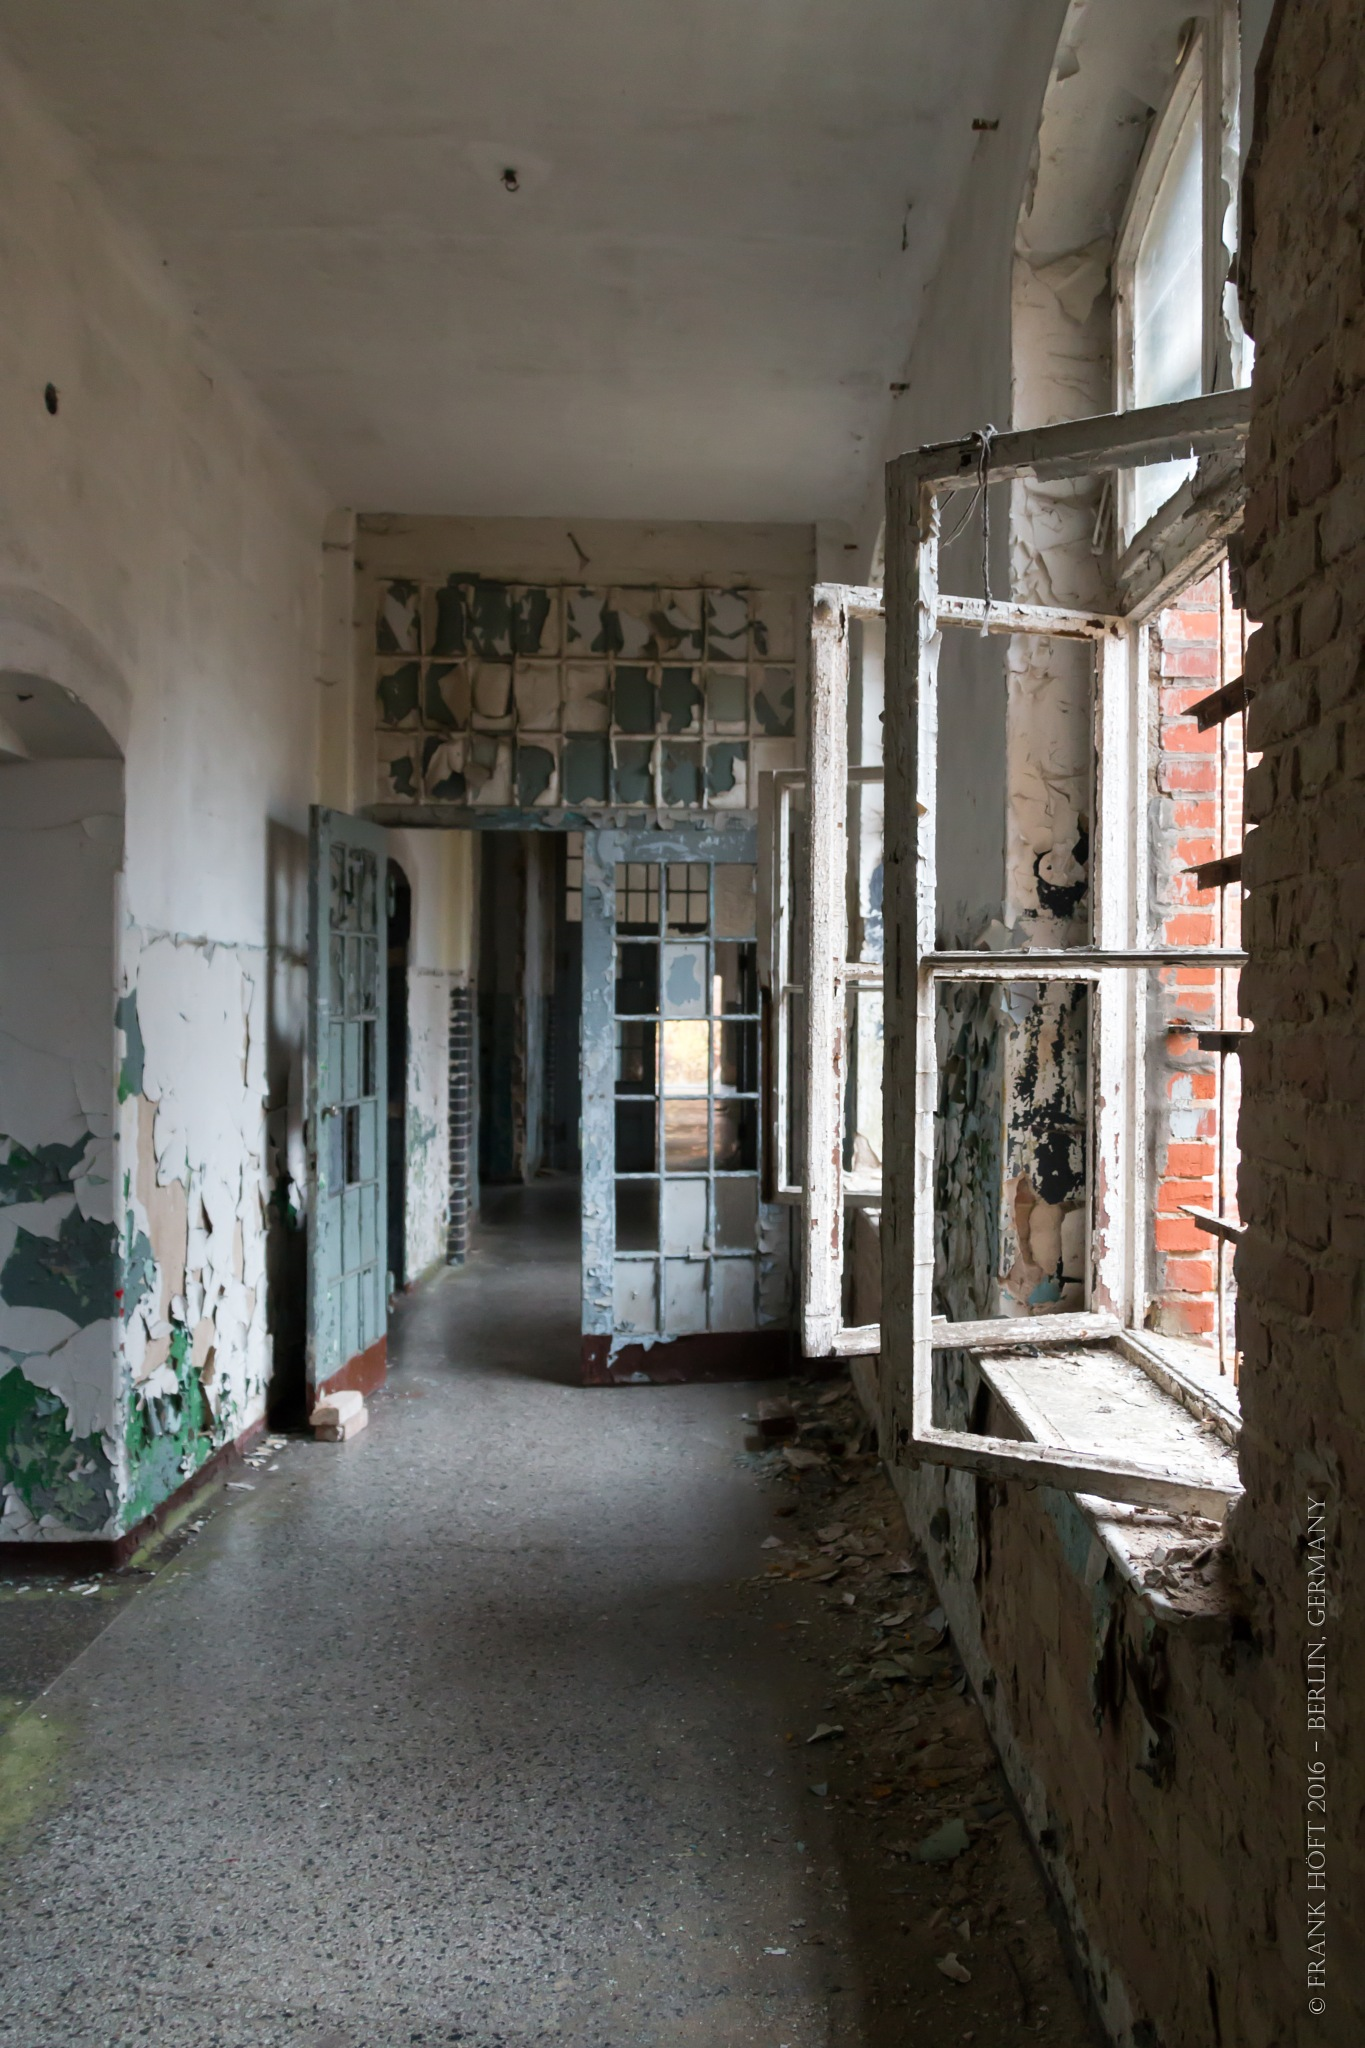 the corridor by Frank Höft